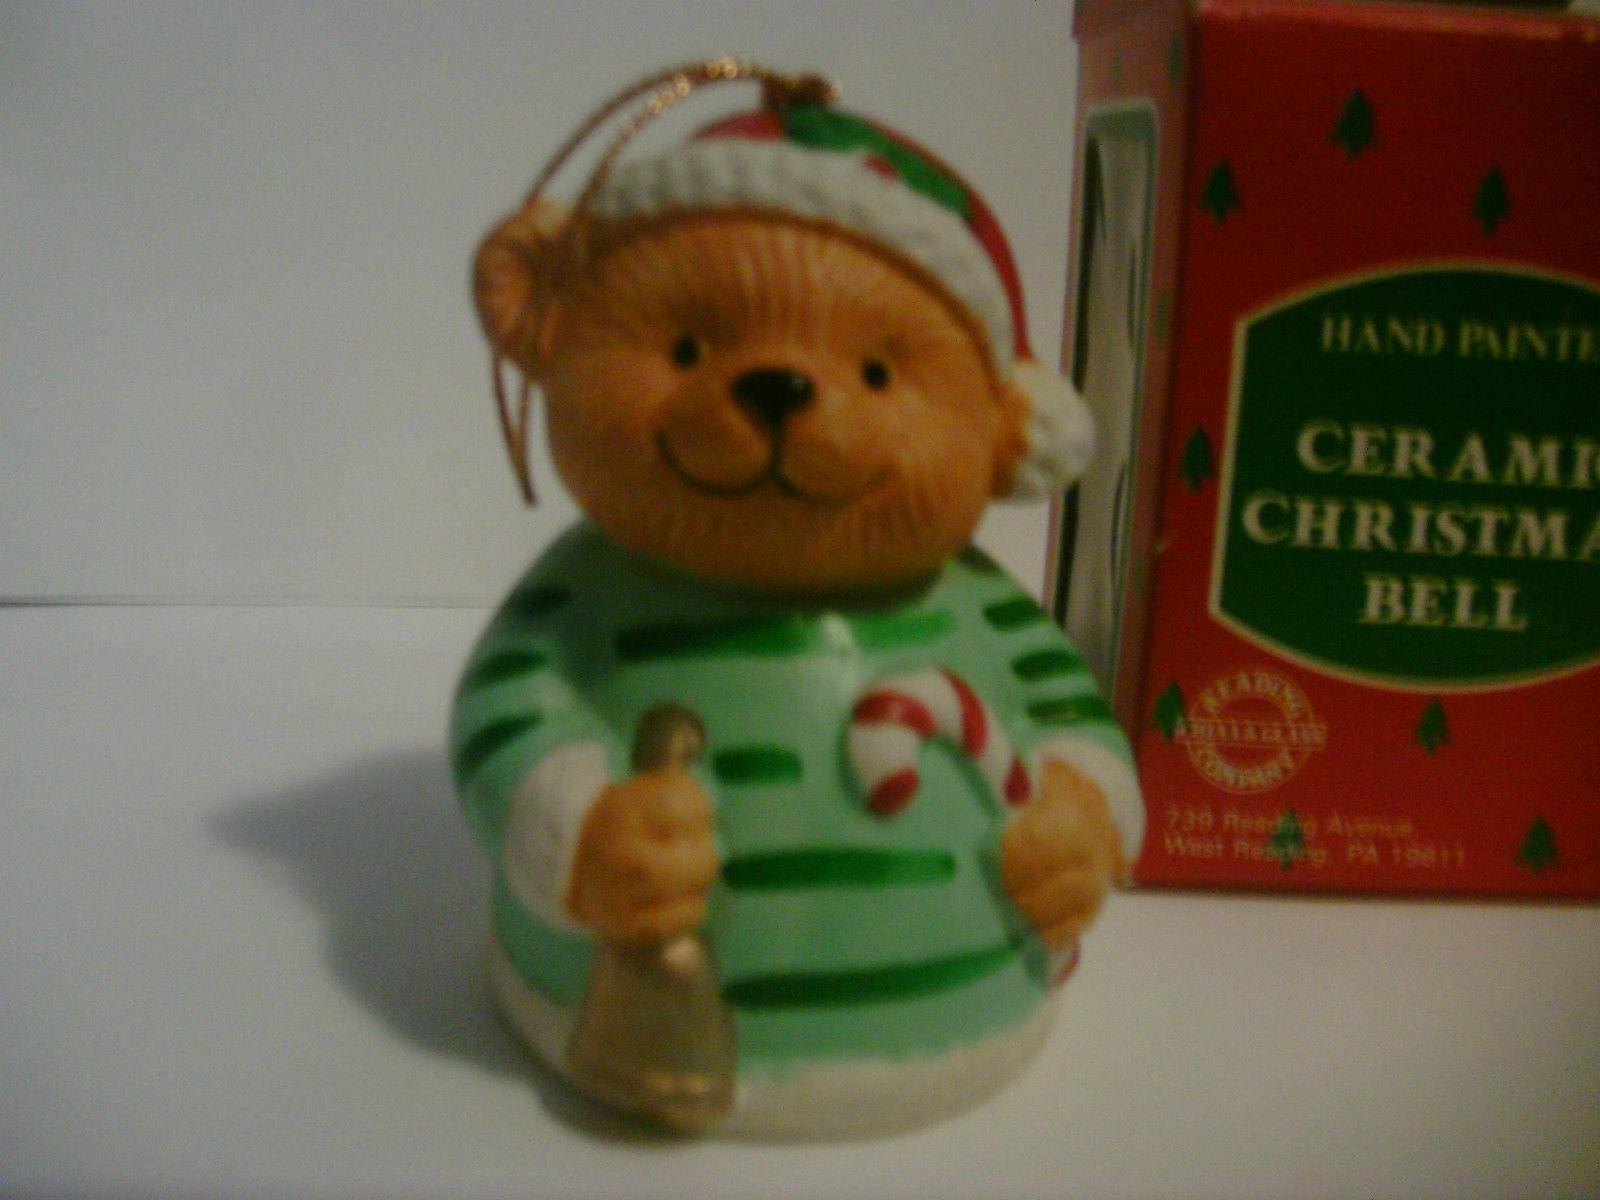 Ceramic Christmas Bell Hand Painted Bear